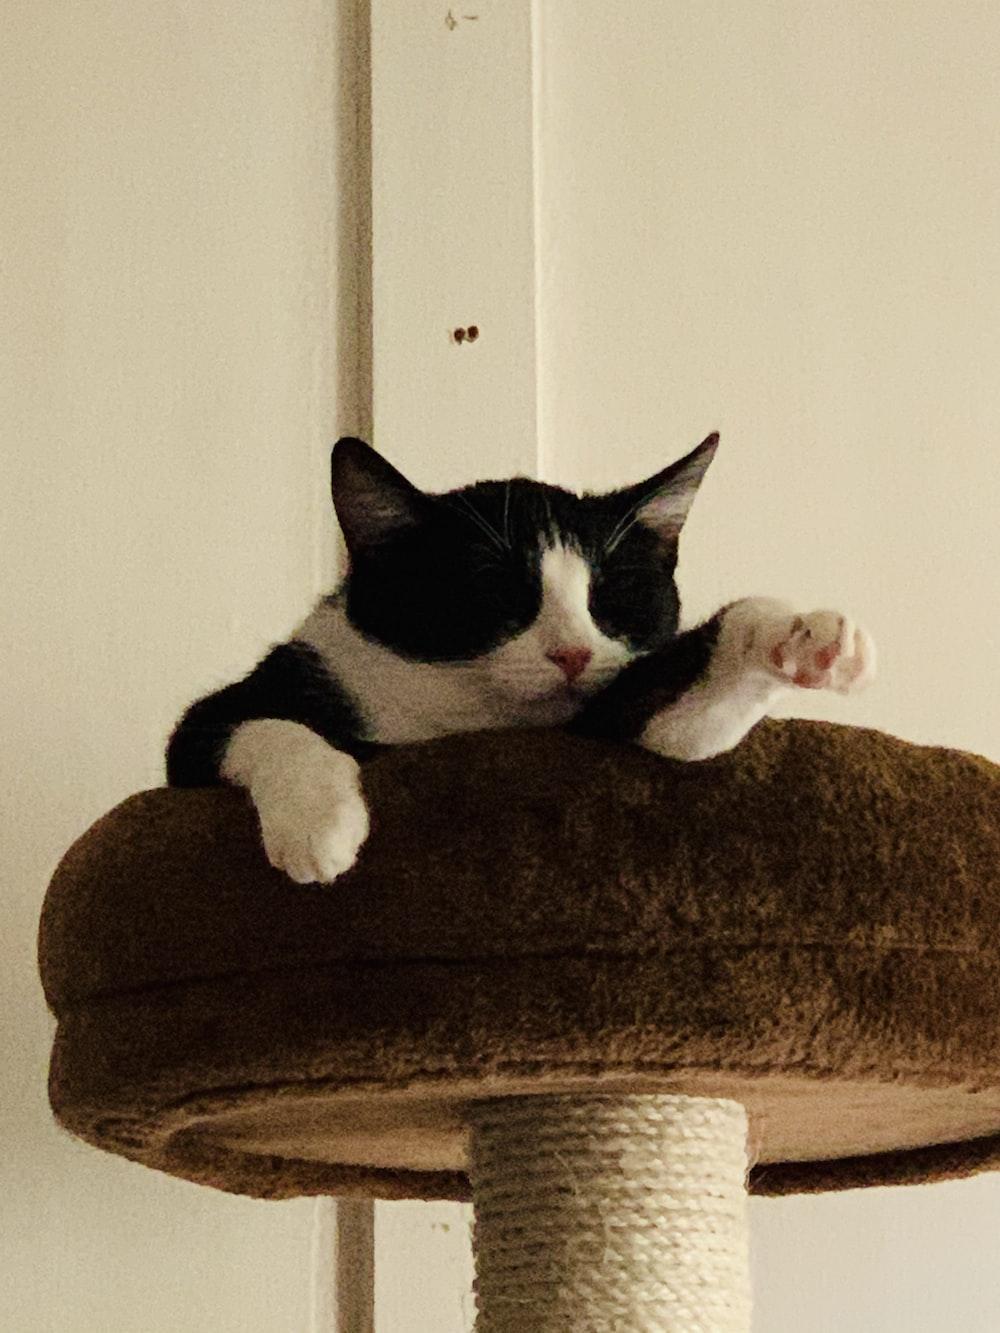 tuxedo cat lying on brown cushion